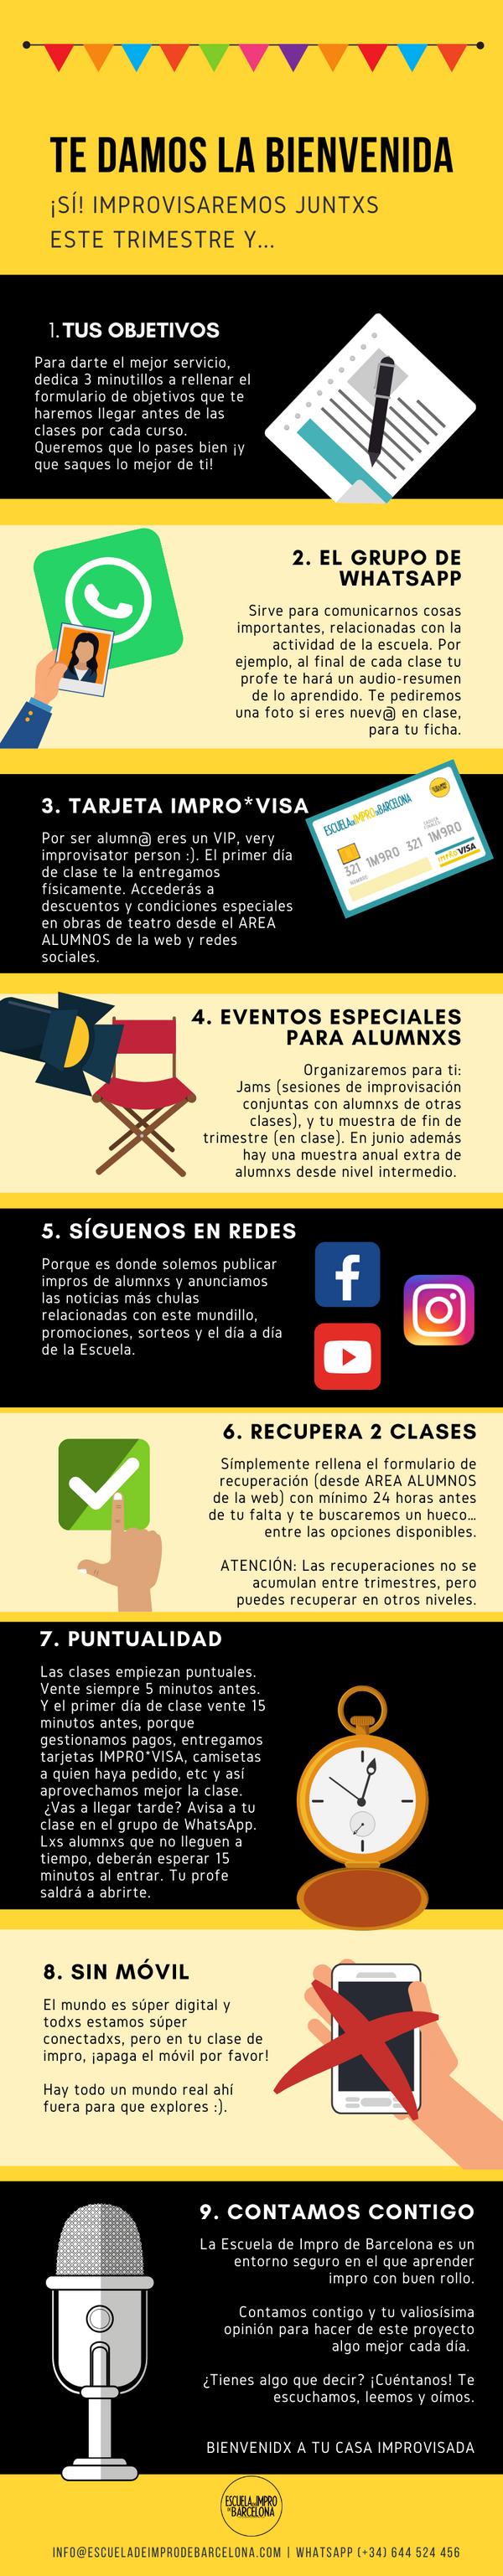 infografía_bienvenidxs_a_EIB.png